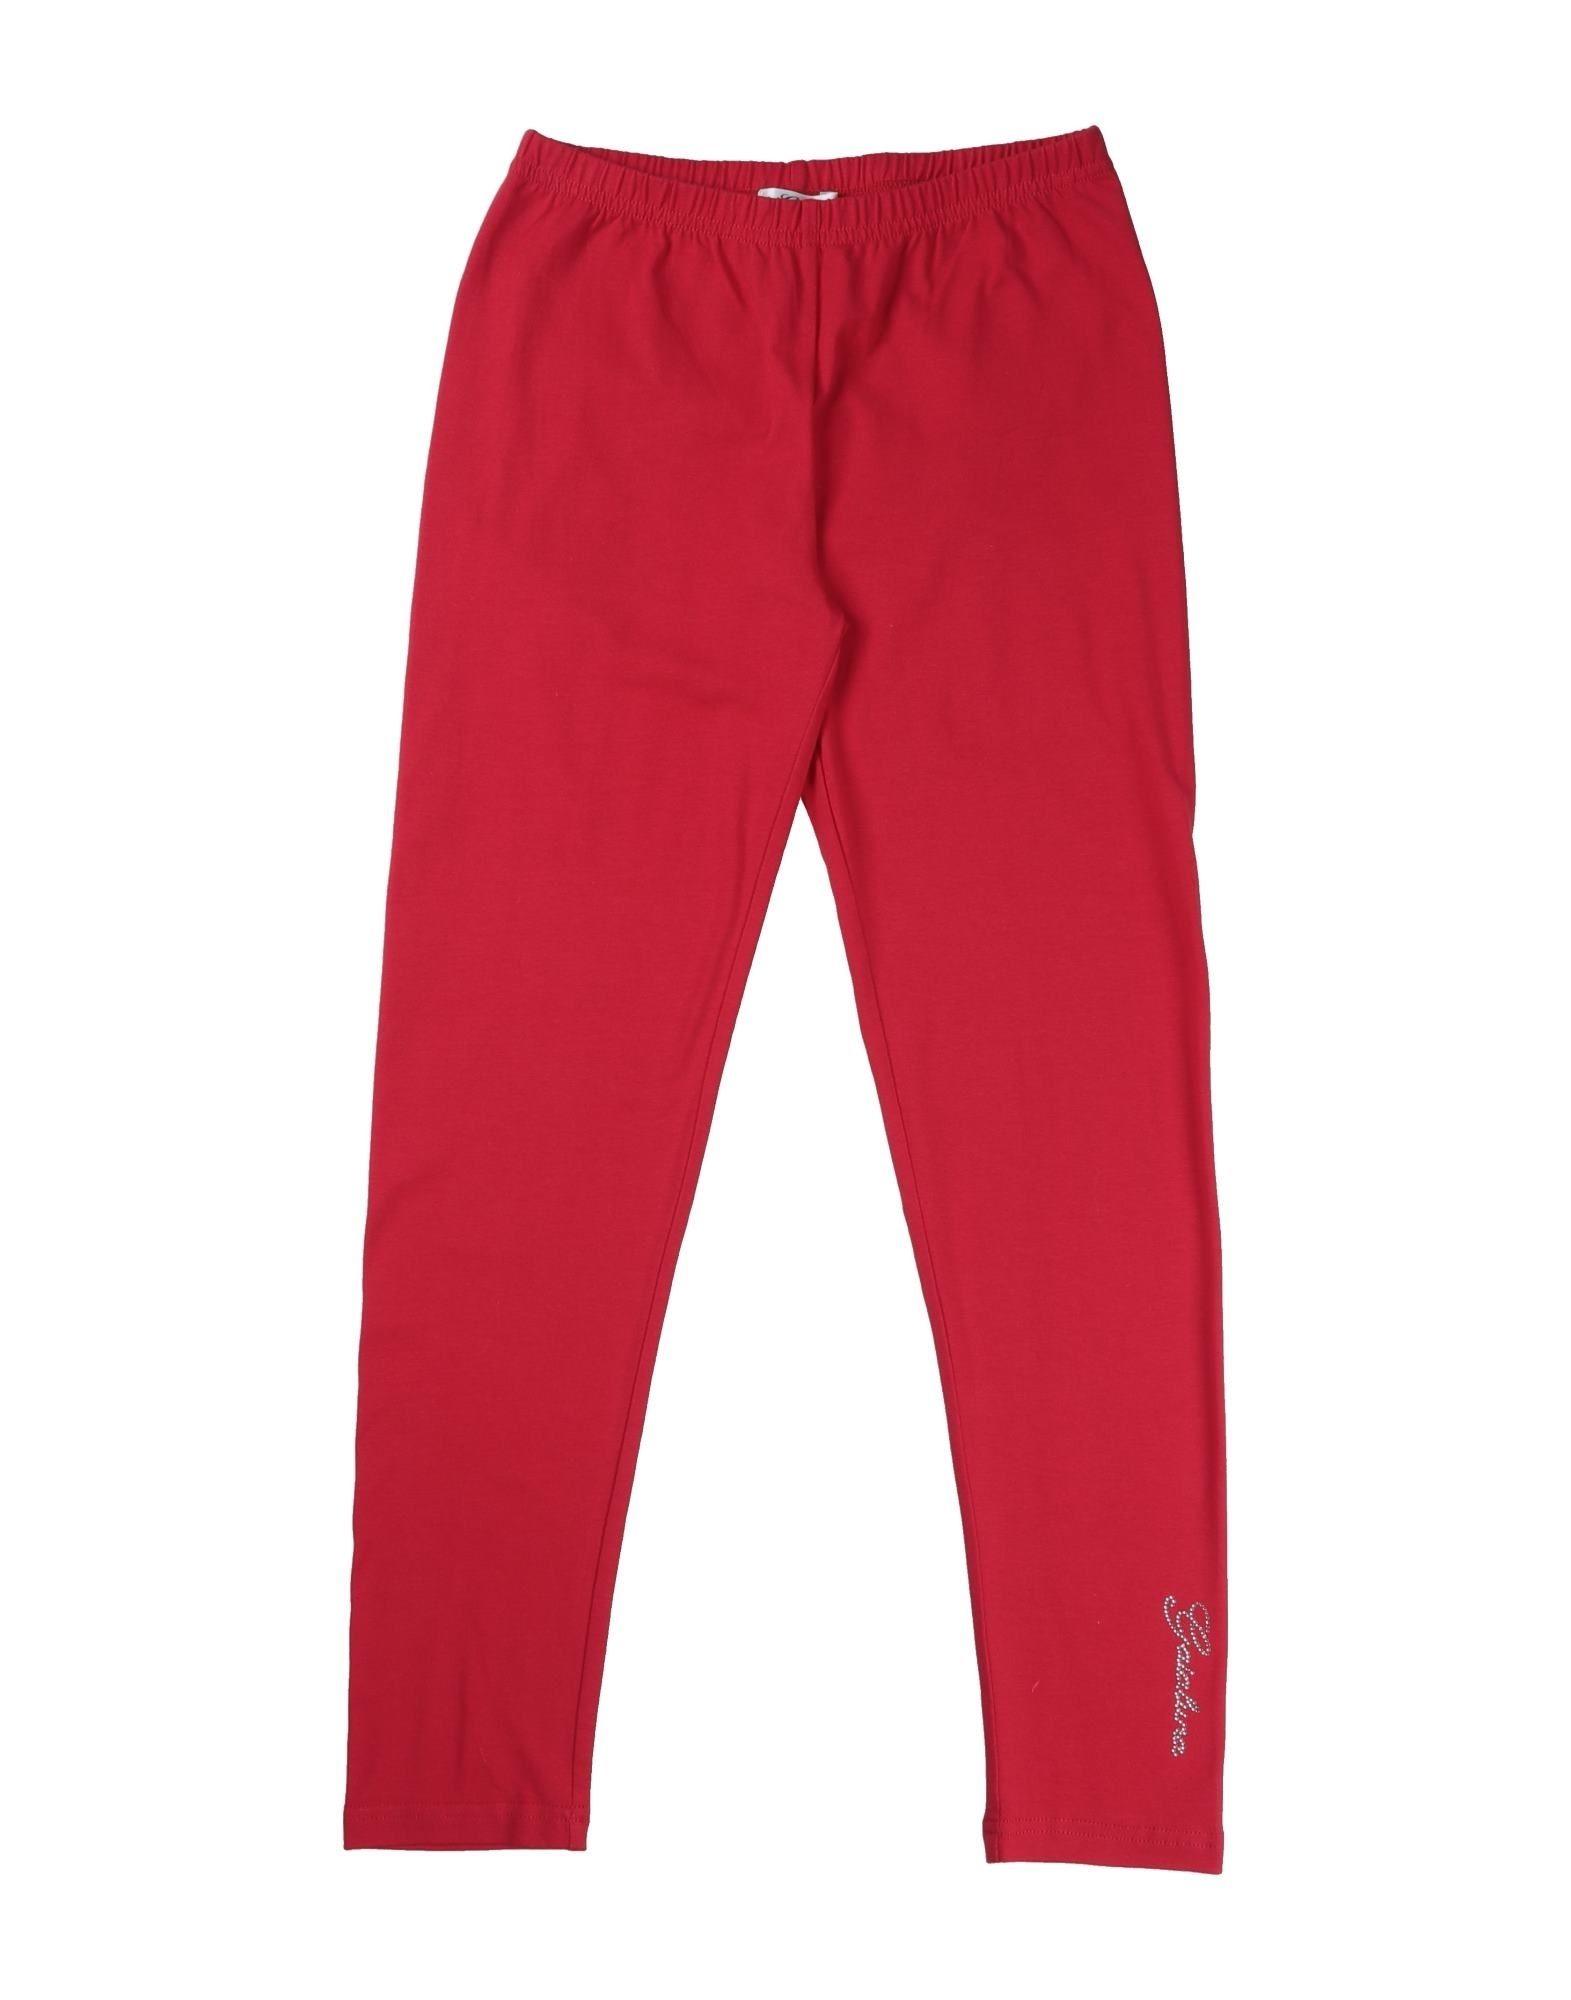 Gaialuna Kids' Leggings In Red